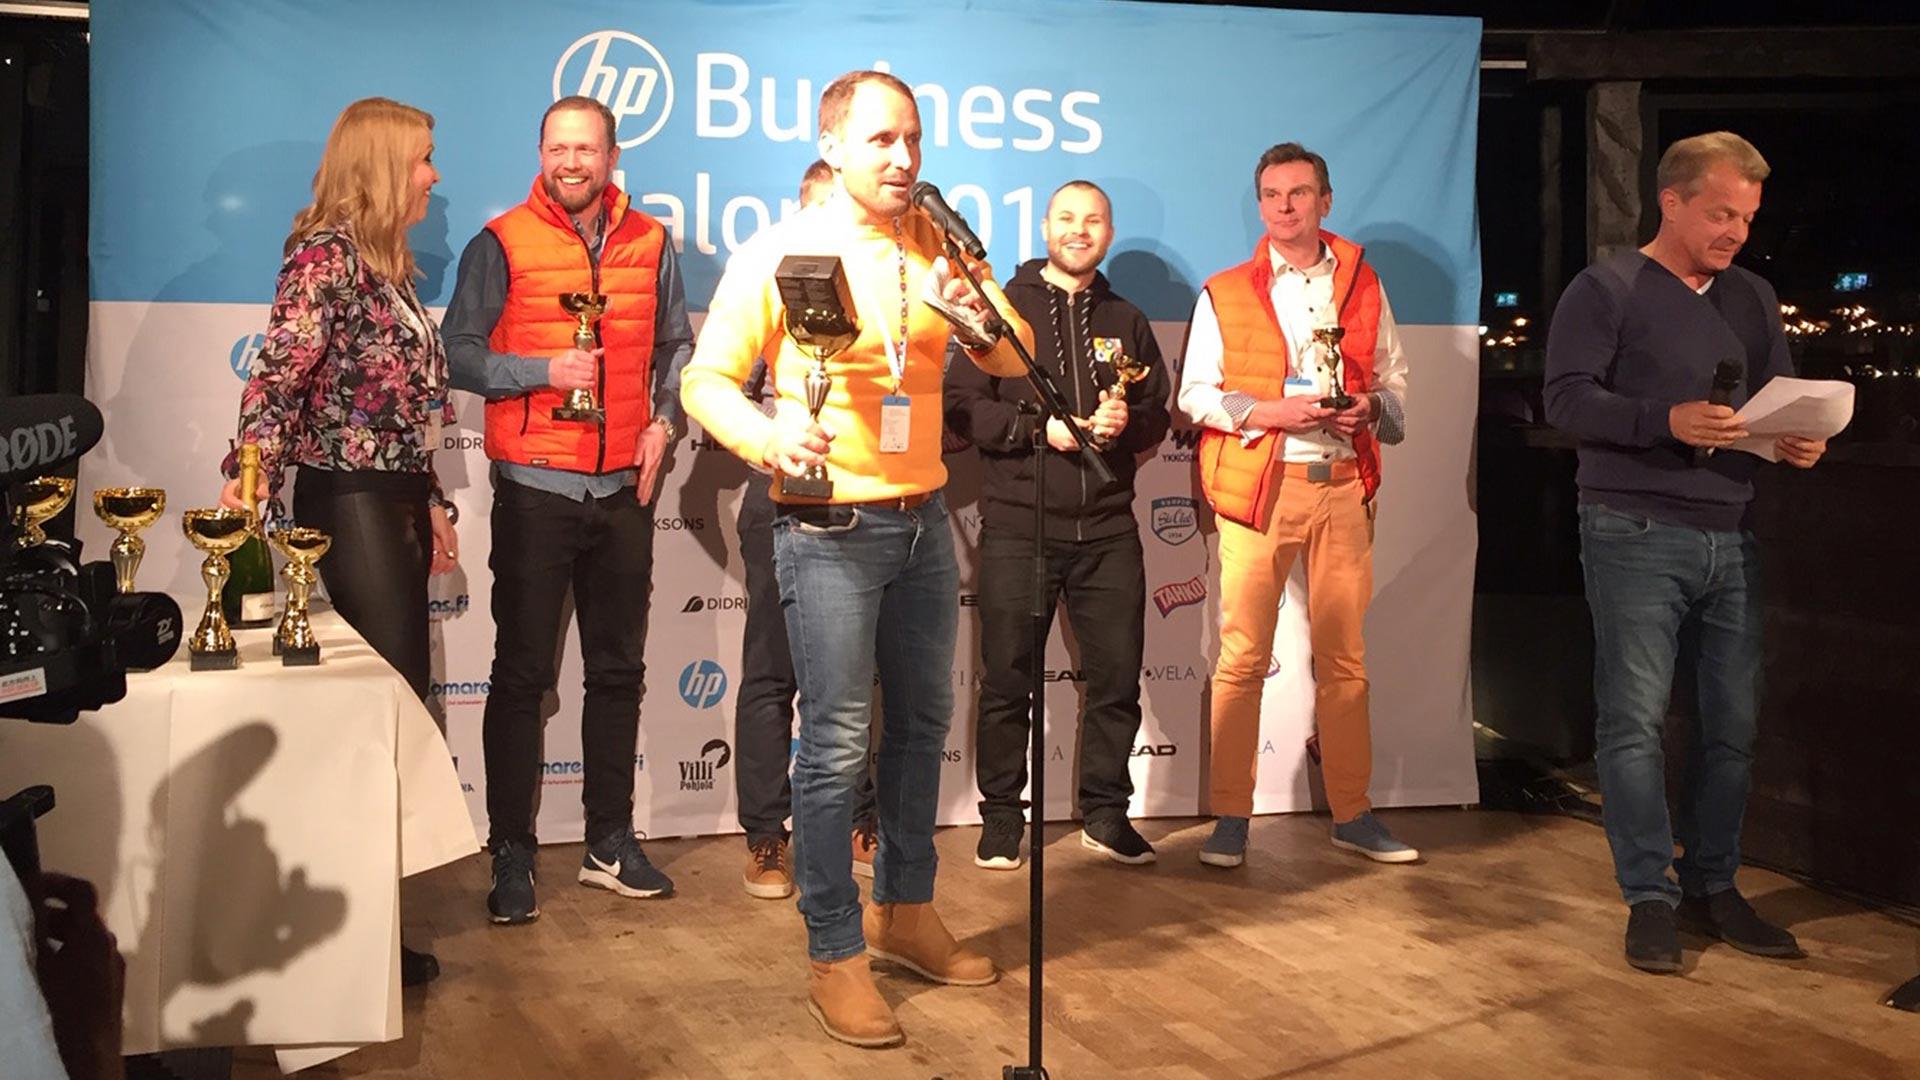 Coloron-vaki-rohmusi-palkintoja-Business-Slalomissa